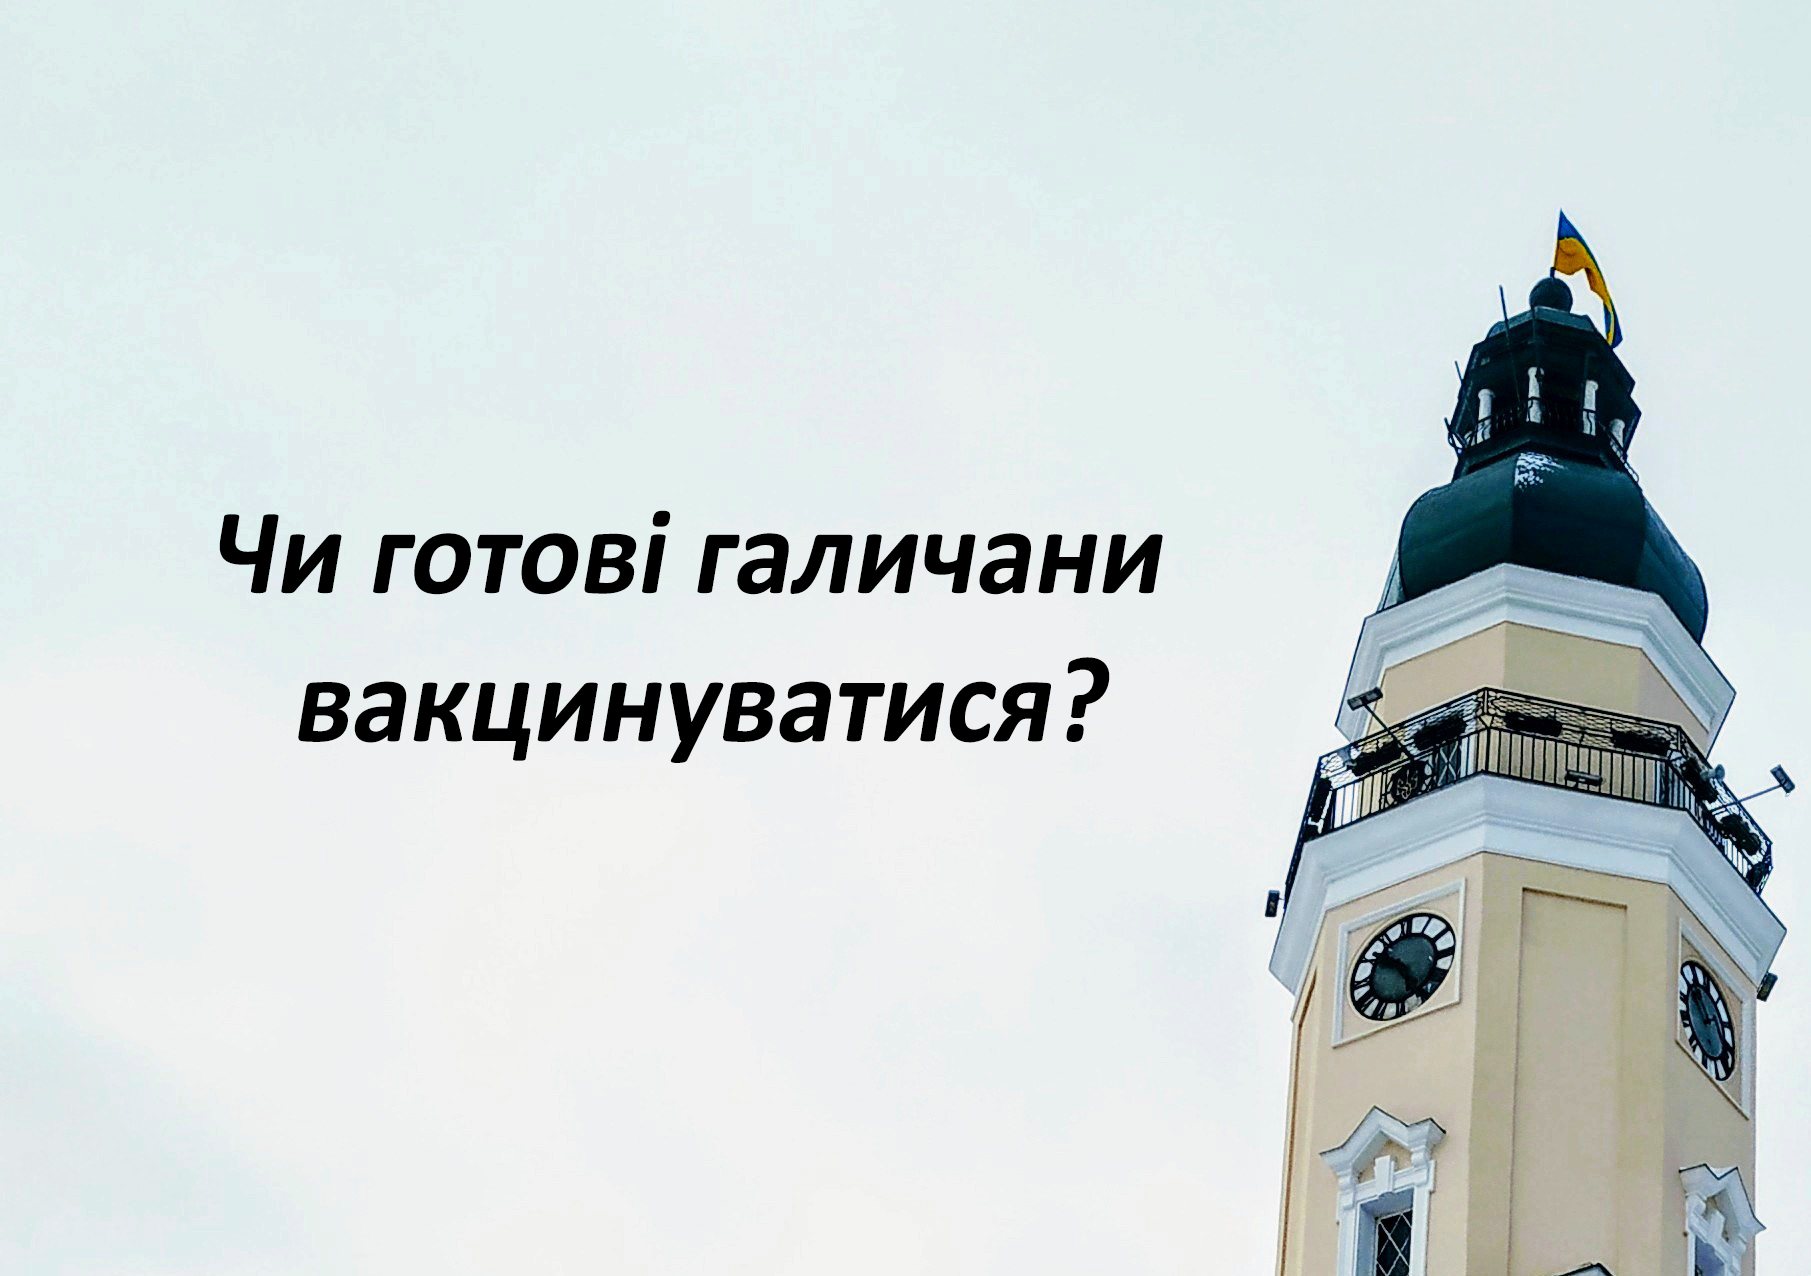 IMG_20190125_10195244.jpg